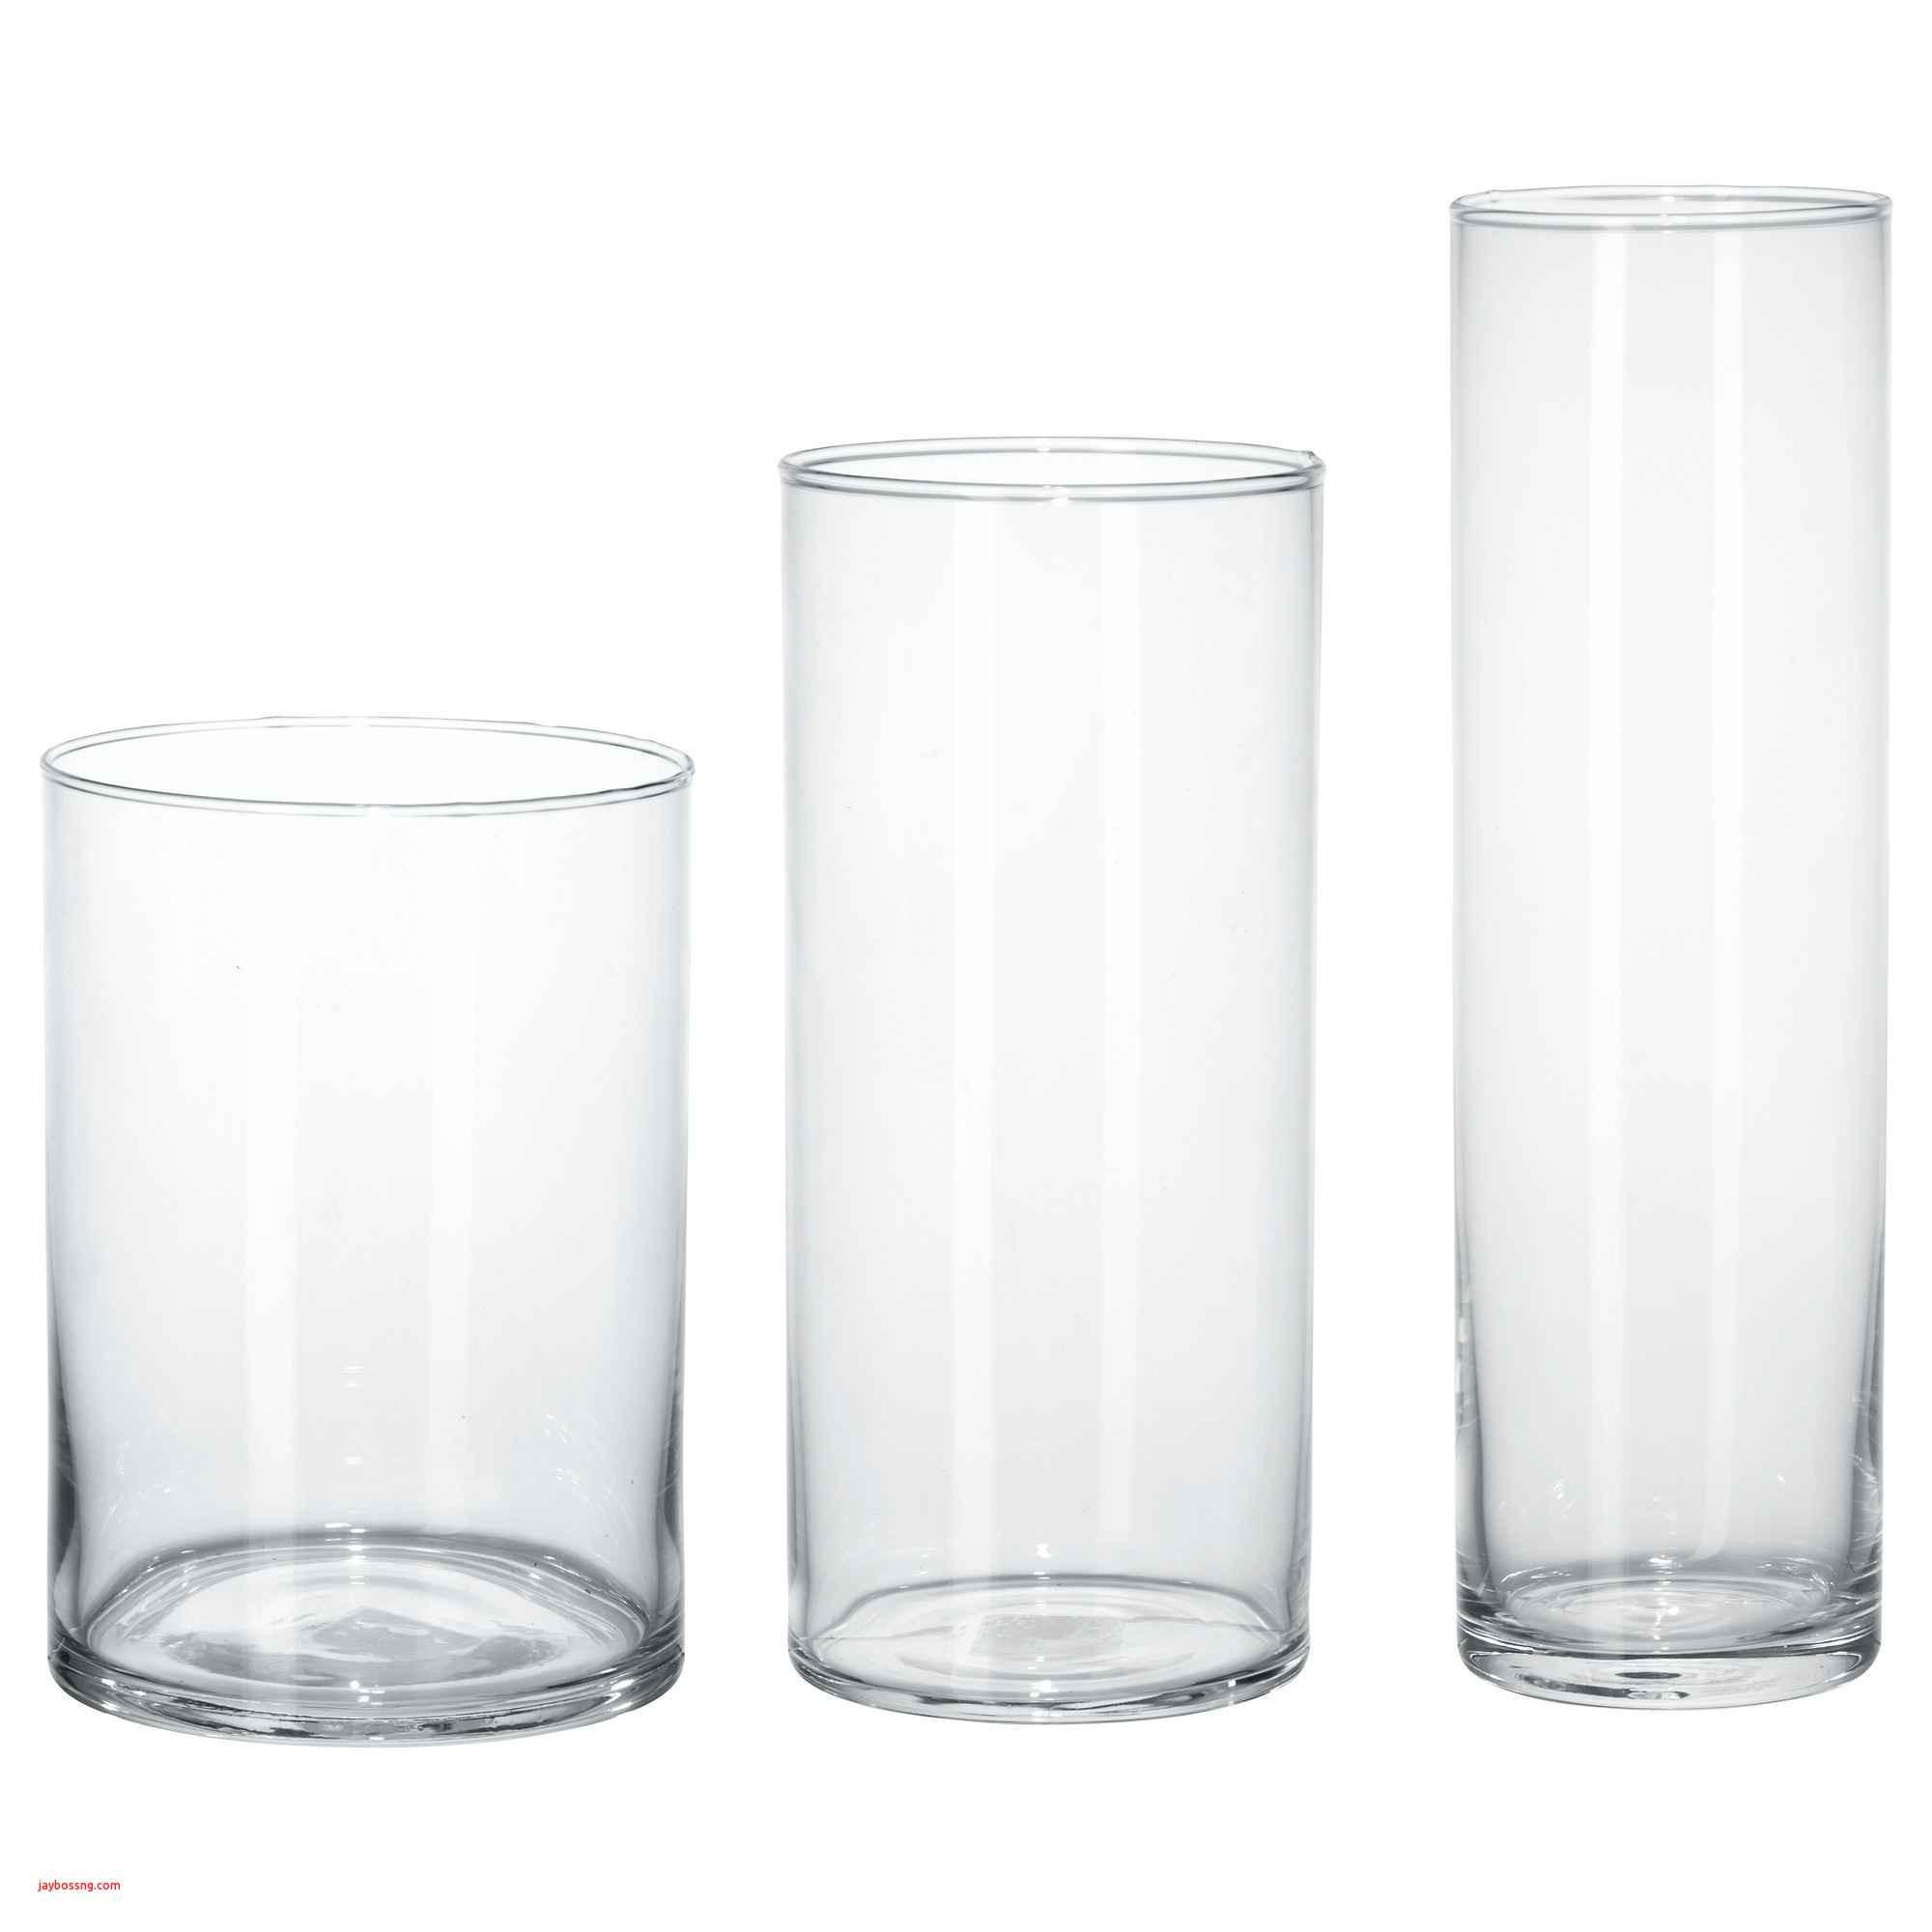 white vases for sale of white vase filler photos ikea white table created pe s5h vases ikea for white vase filler photos ikea white table created pe s5h vases ikea vase i 0d bladet